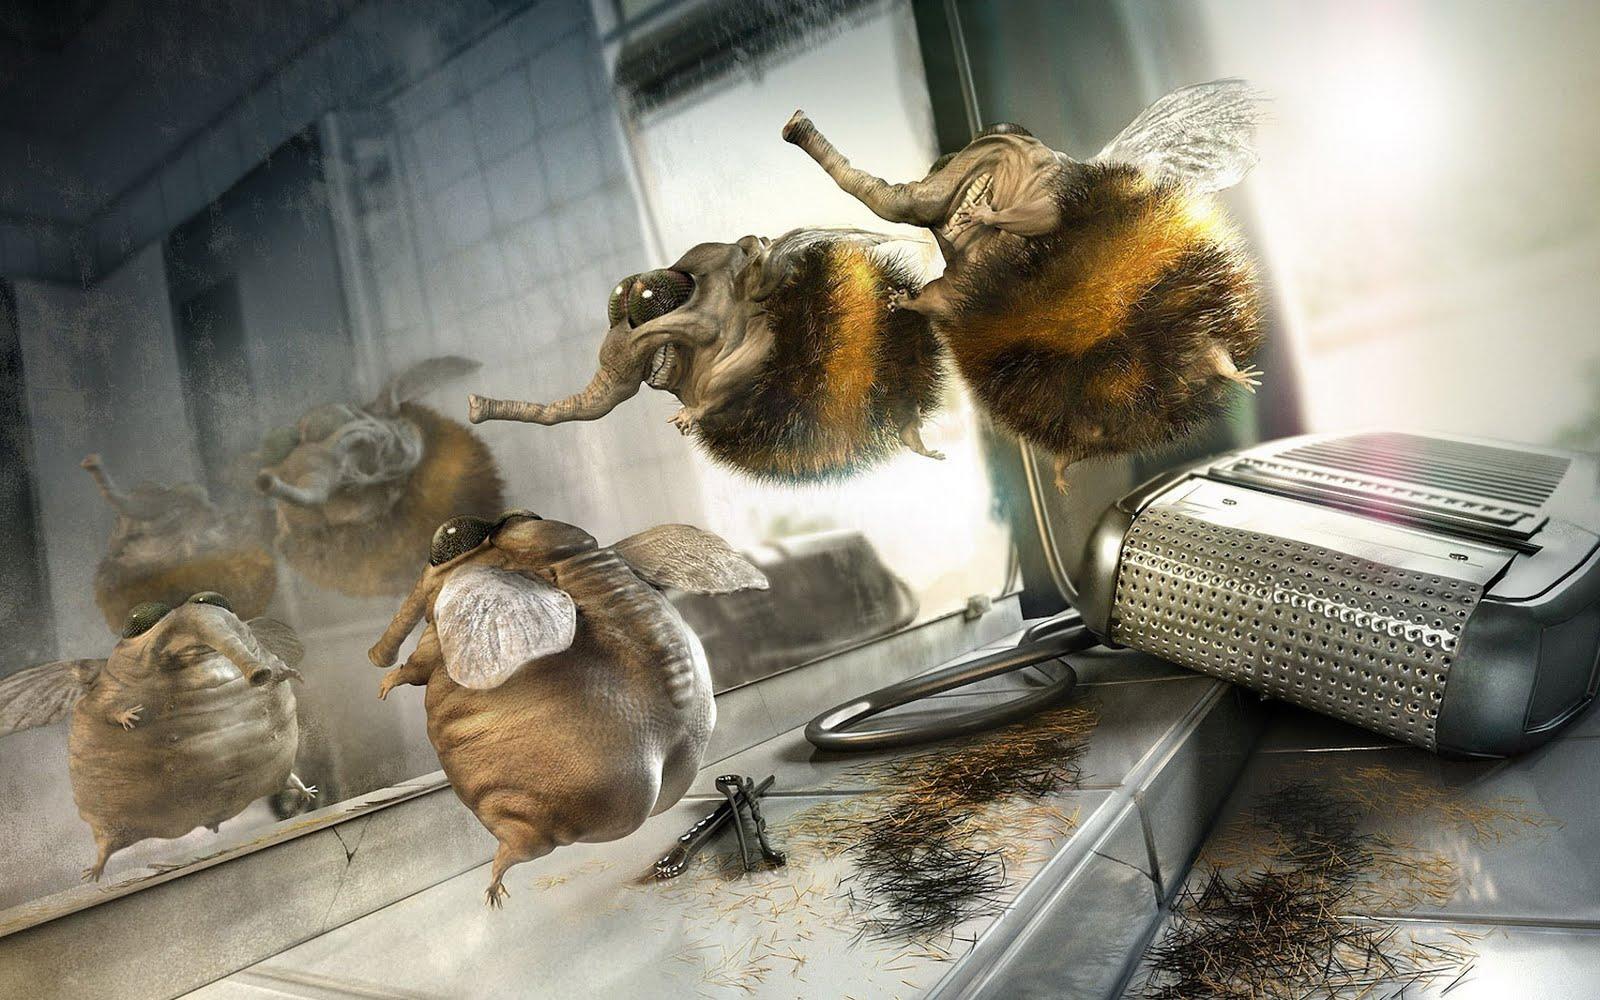 http://1.bp.blogspot.com/-m-w5hRT8_VY/TcG4IV__KII/AAAAAAAAAEk/fao3LsmPy74/s1600/funny-wallpaper-bees.jpg